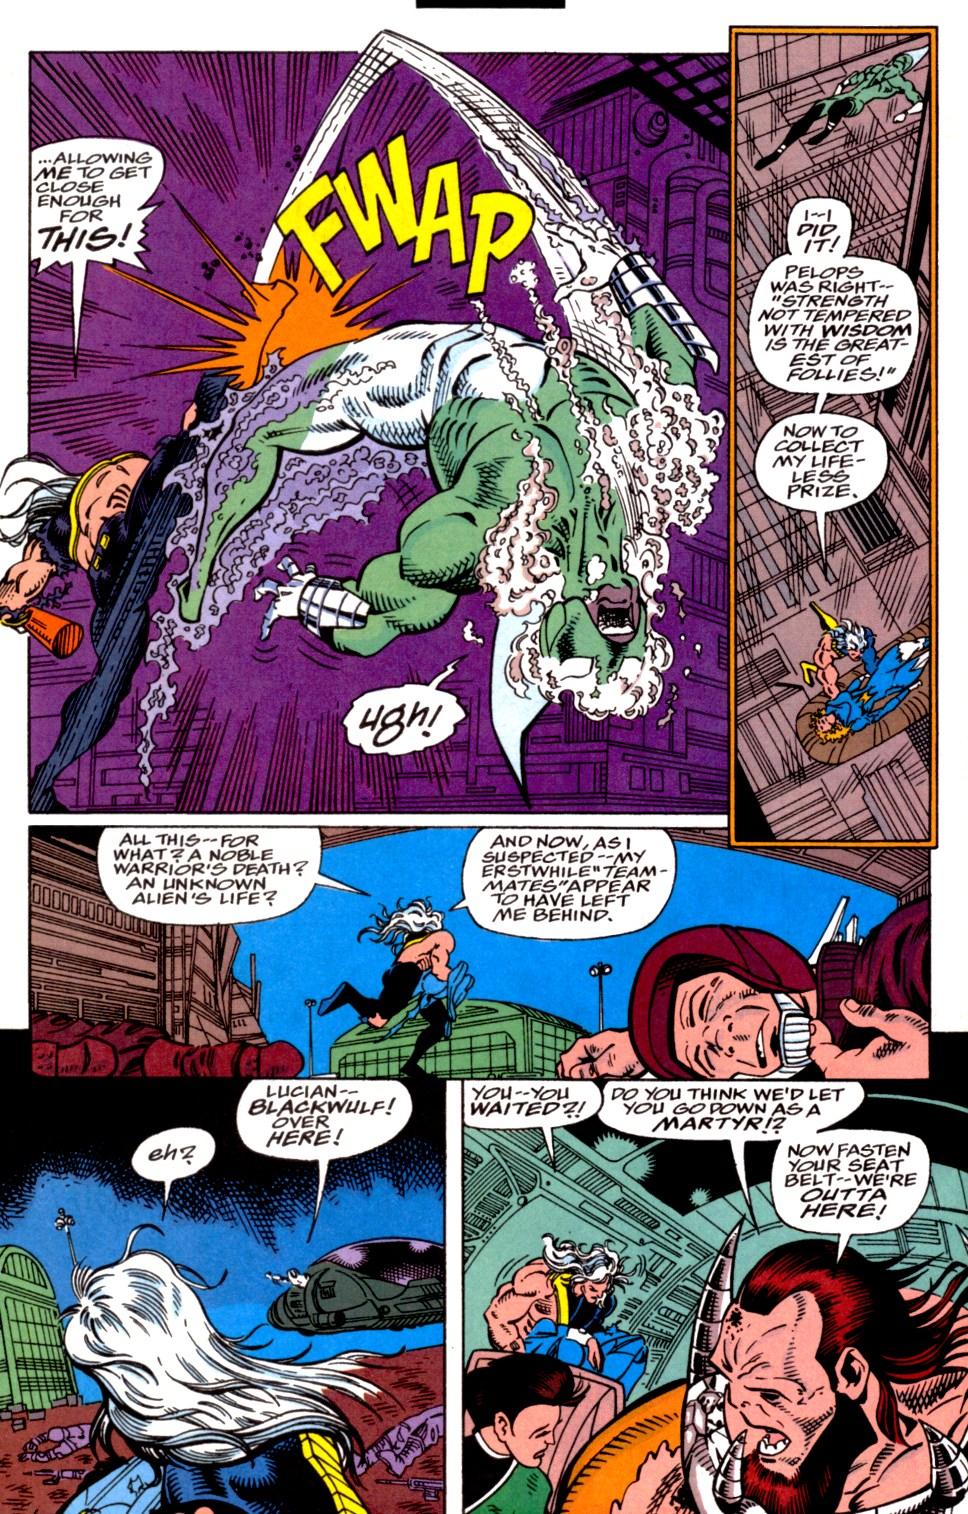 Read online Blackwulf comic -  Issue #4 - 11